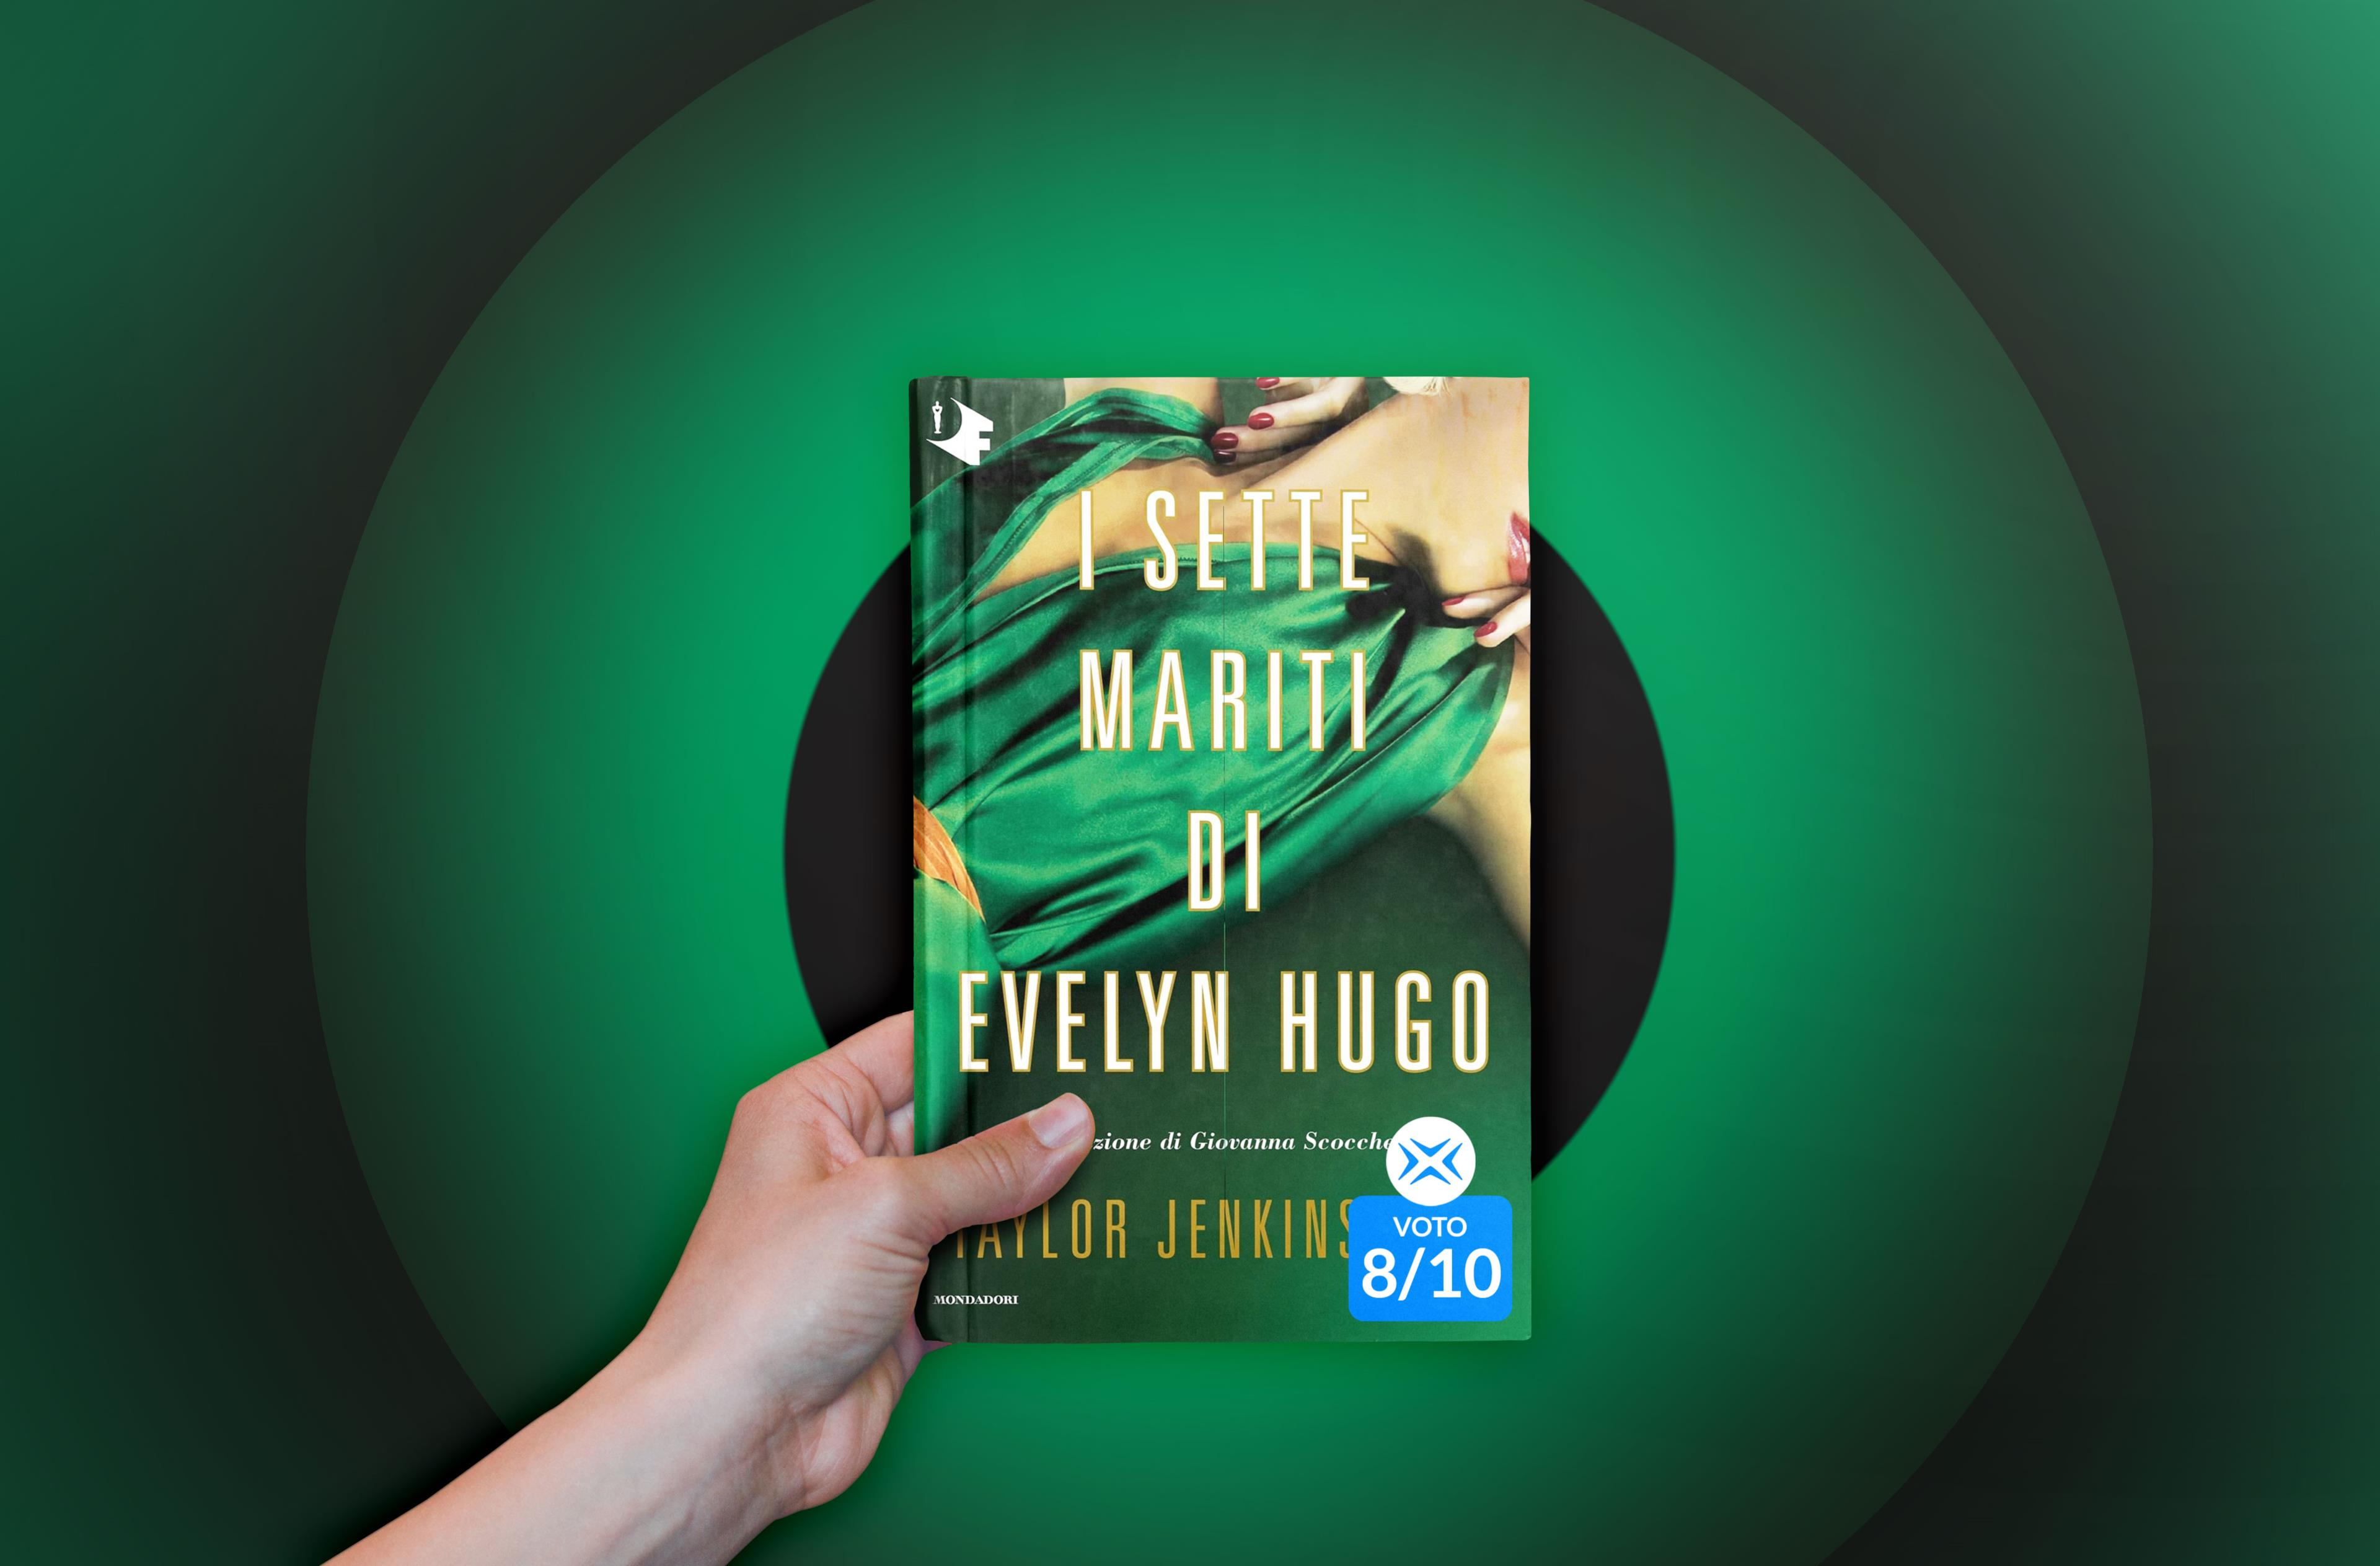 La copertina de I sette mariti di Evelyn Hugo